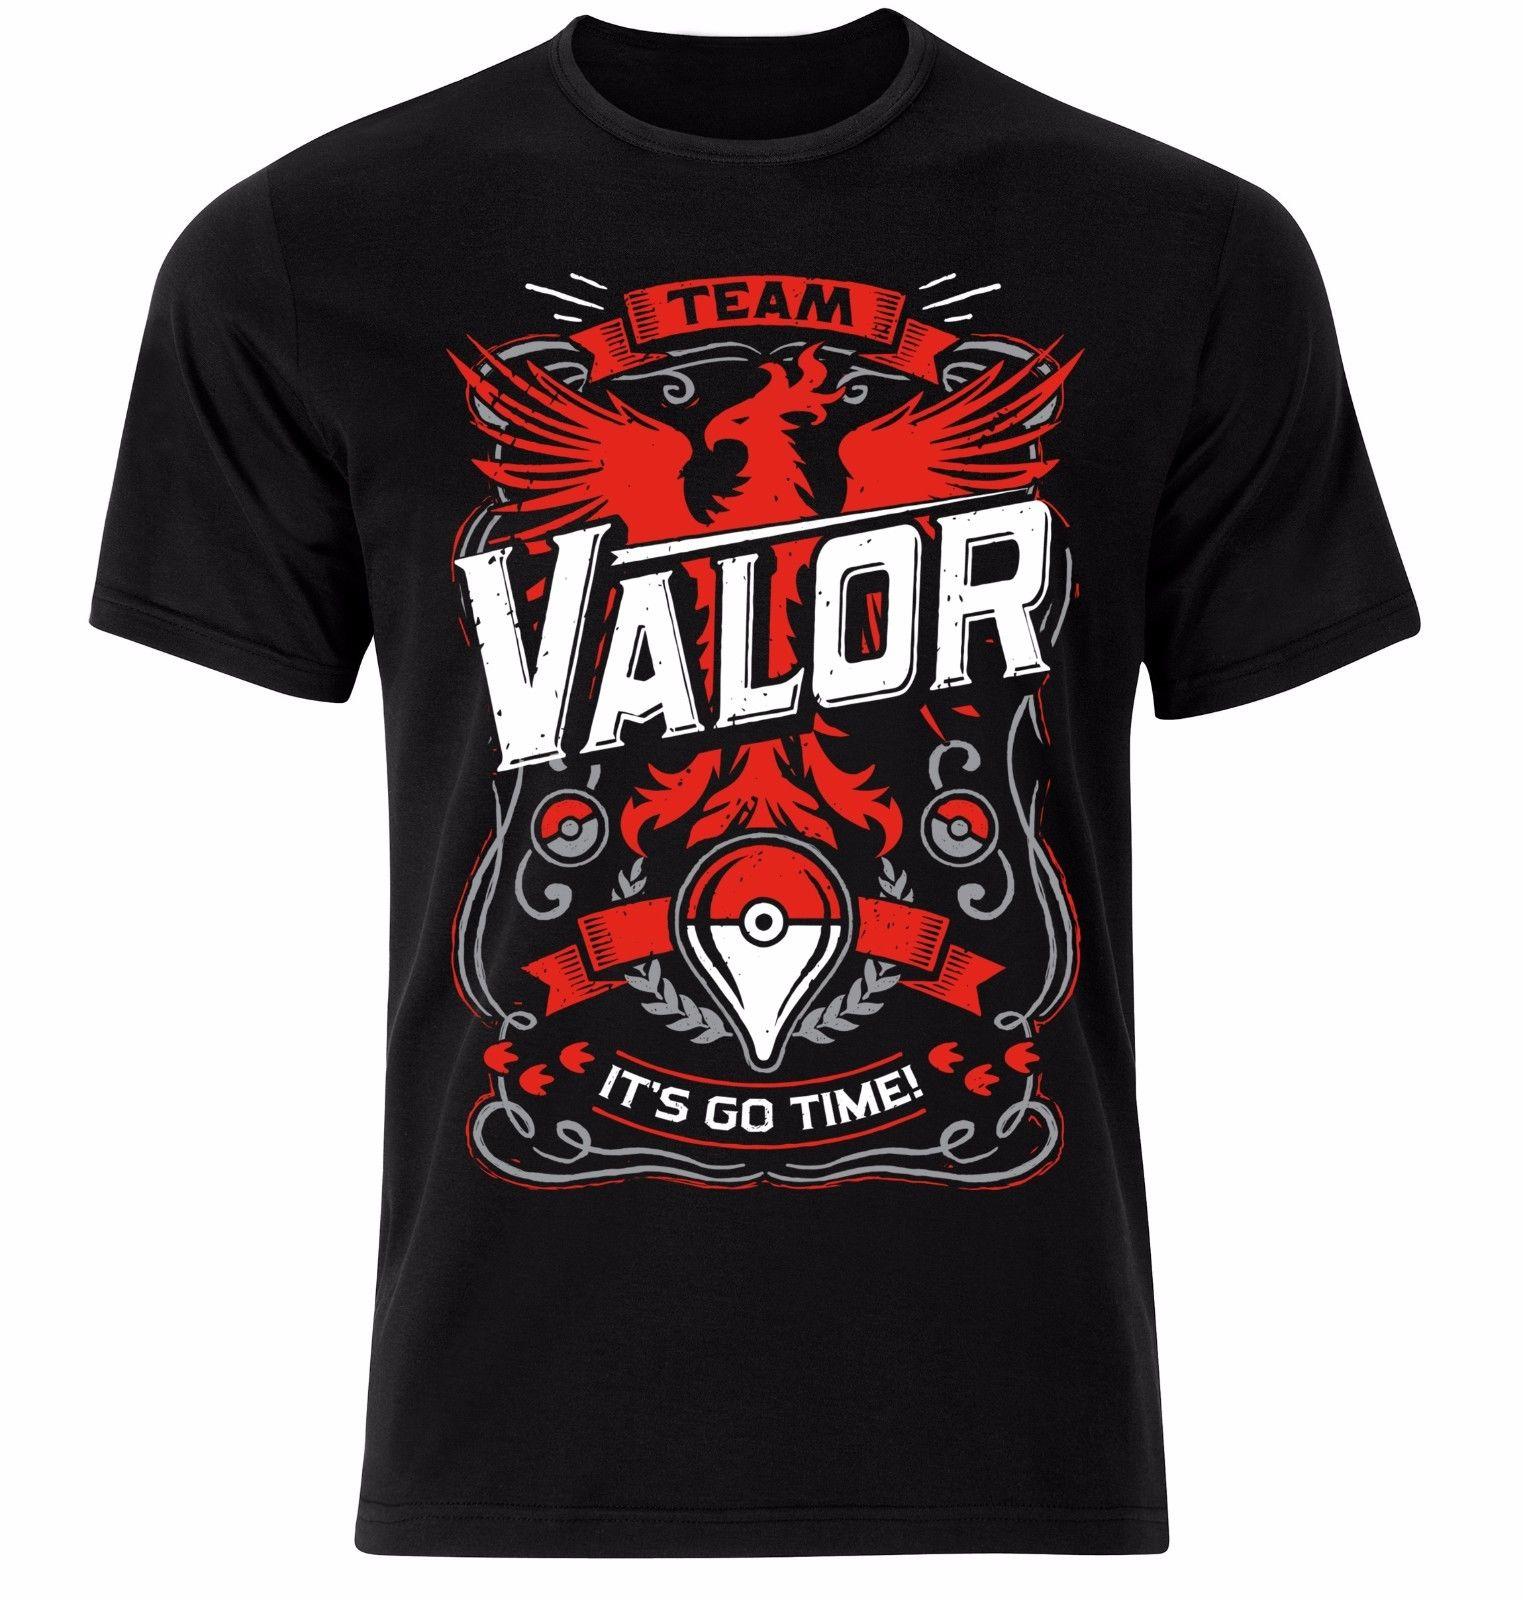 font-b-pokemon-b-font-team-valor-its-go-time-unisex-black-classic-gamers-ph2-t-shirt-100-cotton-short-sleeve-o-neck-tops-tee-shirts-2018